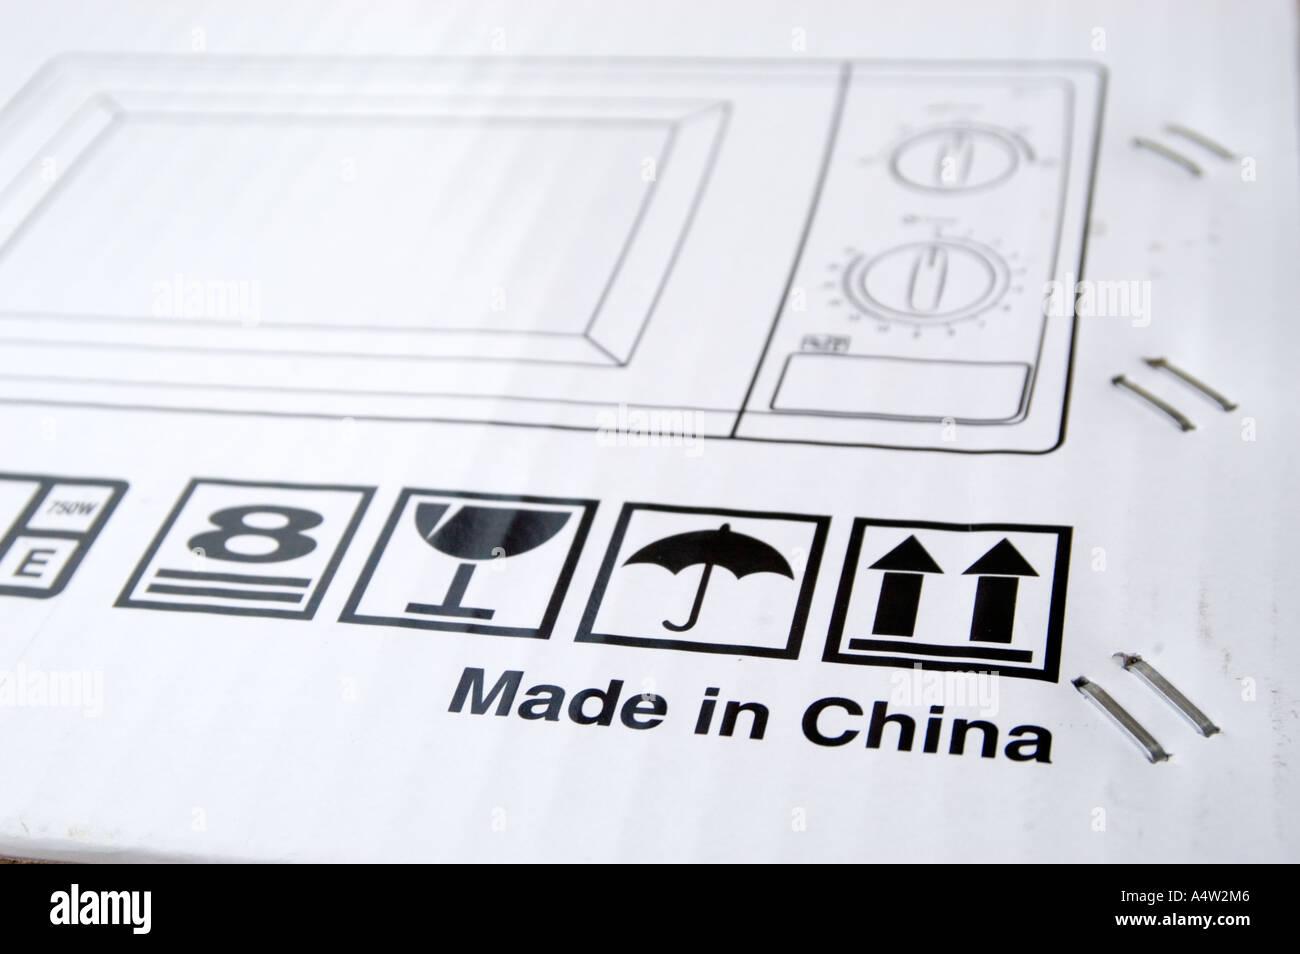 Made in China Immagini Stock